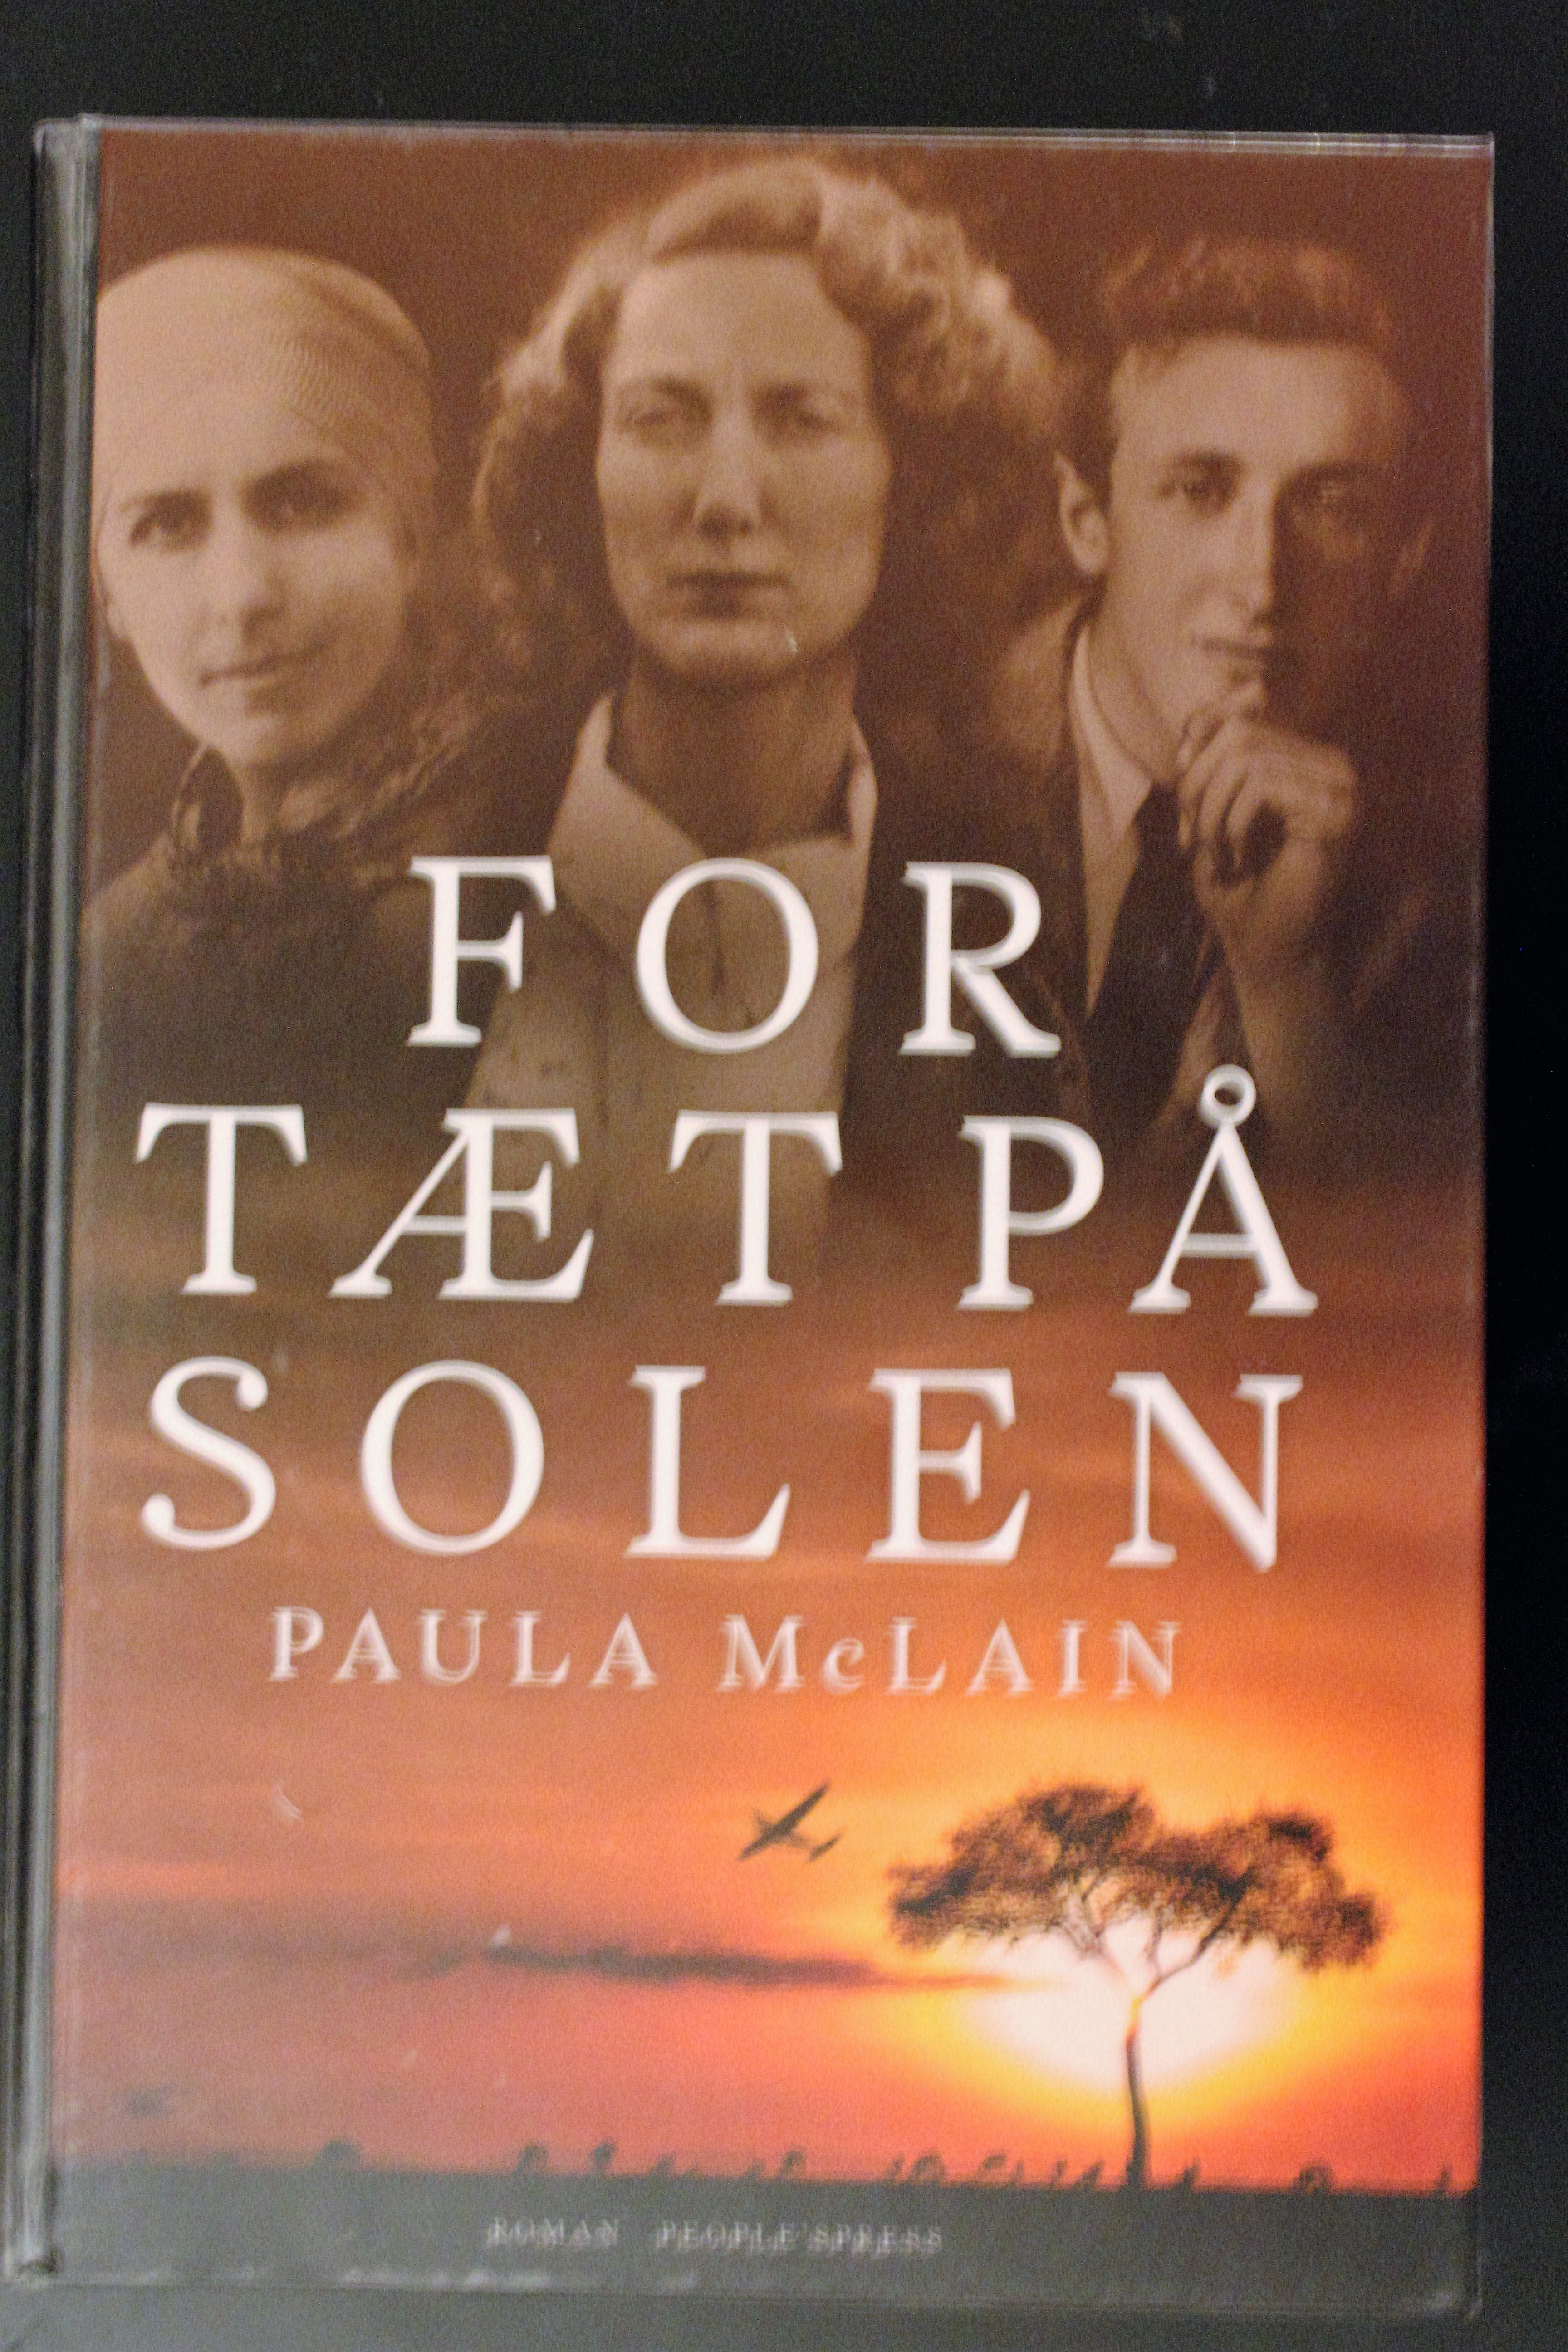 Boganmeldelse For tæt på solen Paula McLain